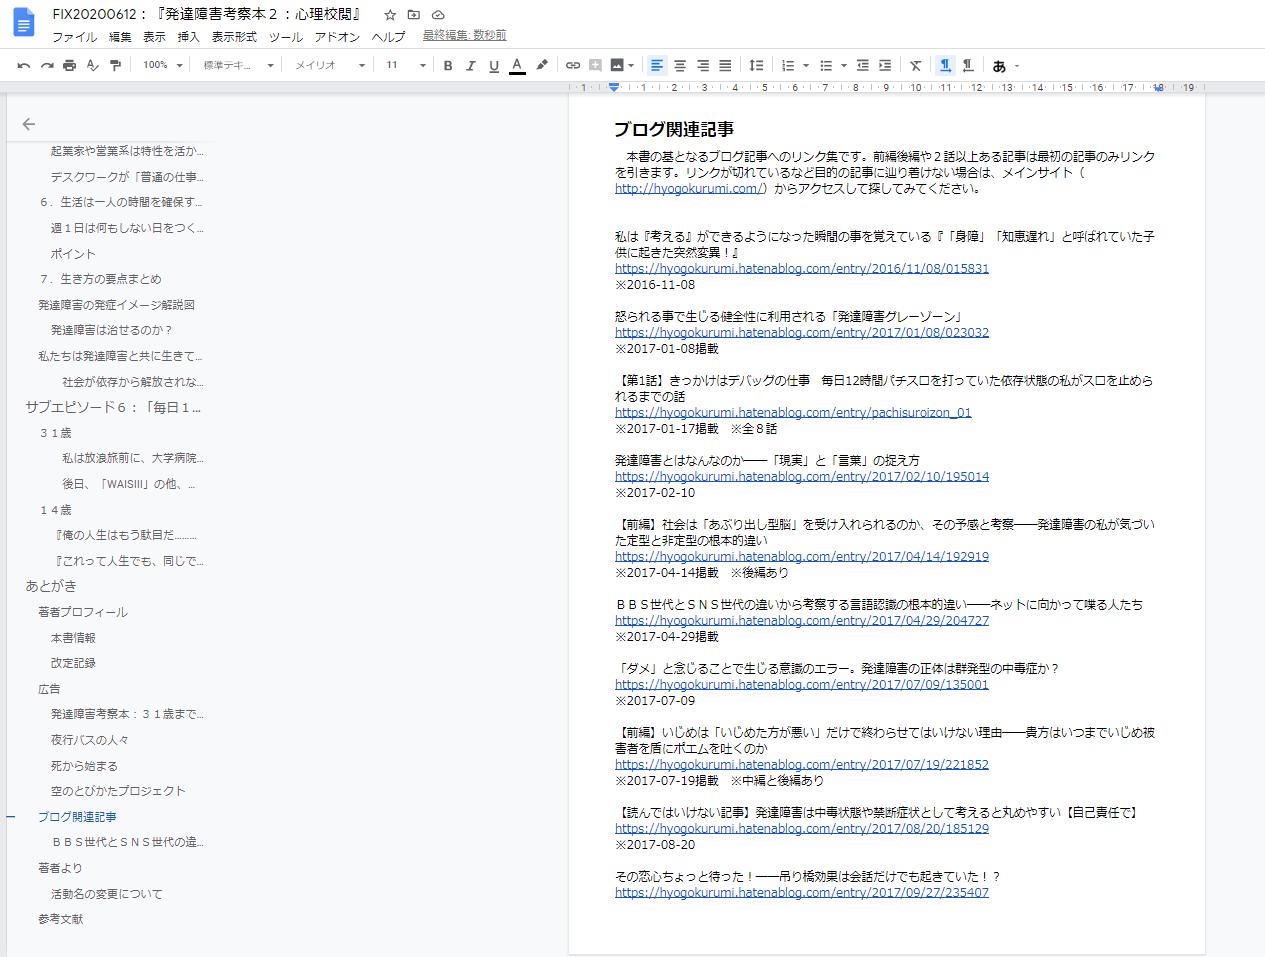 f:id:hyogokurumi:20200629133849p:plain